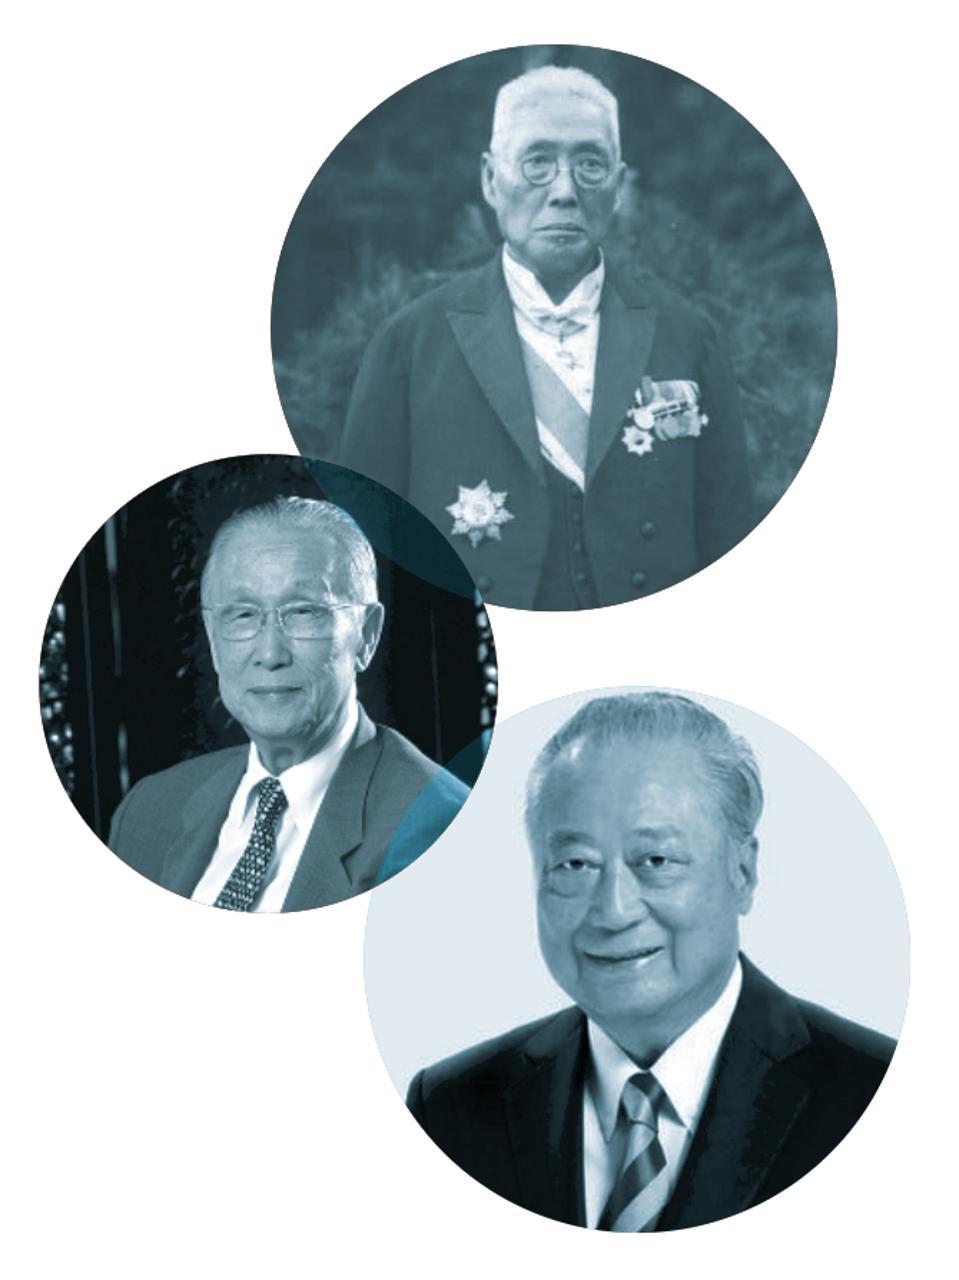 From top: Koo Hsien-jung, Koo Chen-Fu and Jeffrey Koo Sr.